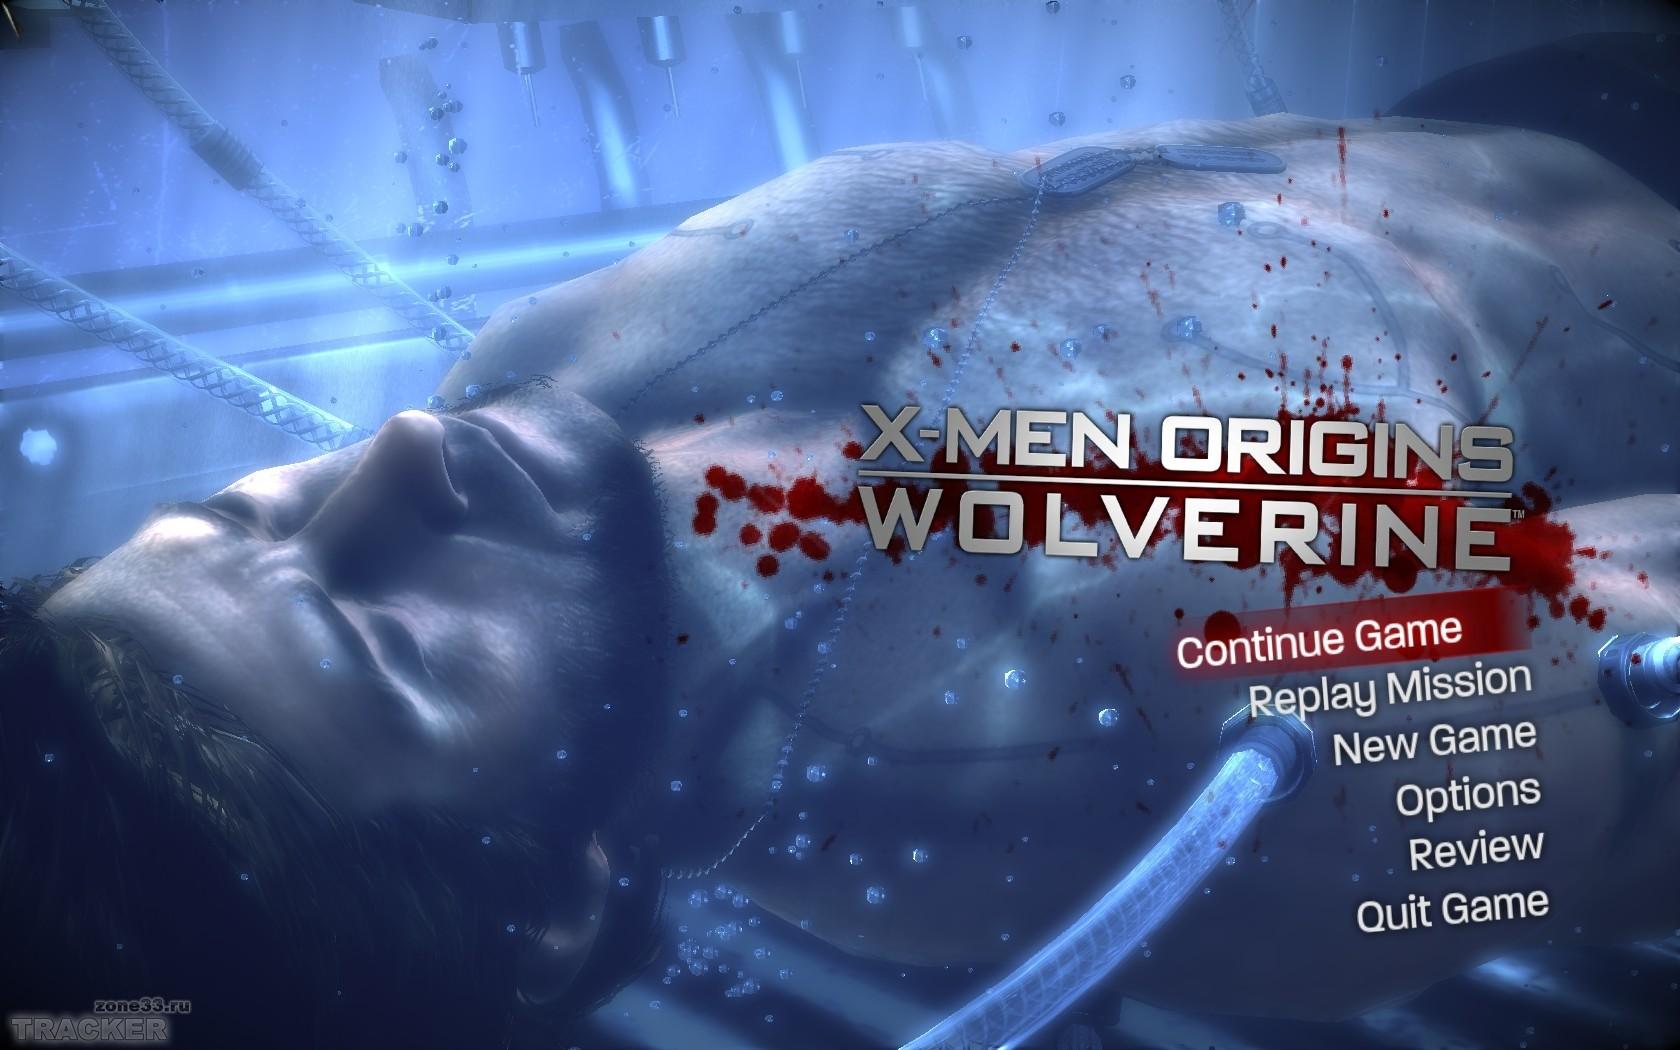 Русификатор для X-Men Origins Wolverine. текст. 2009. Скриншоты